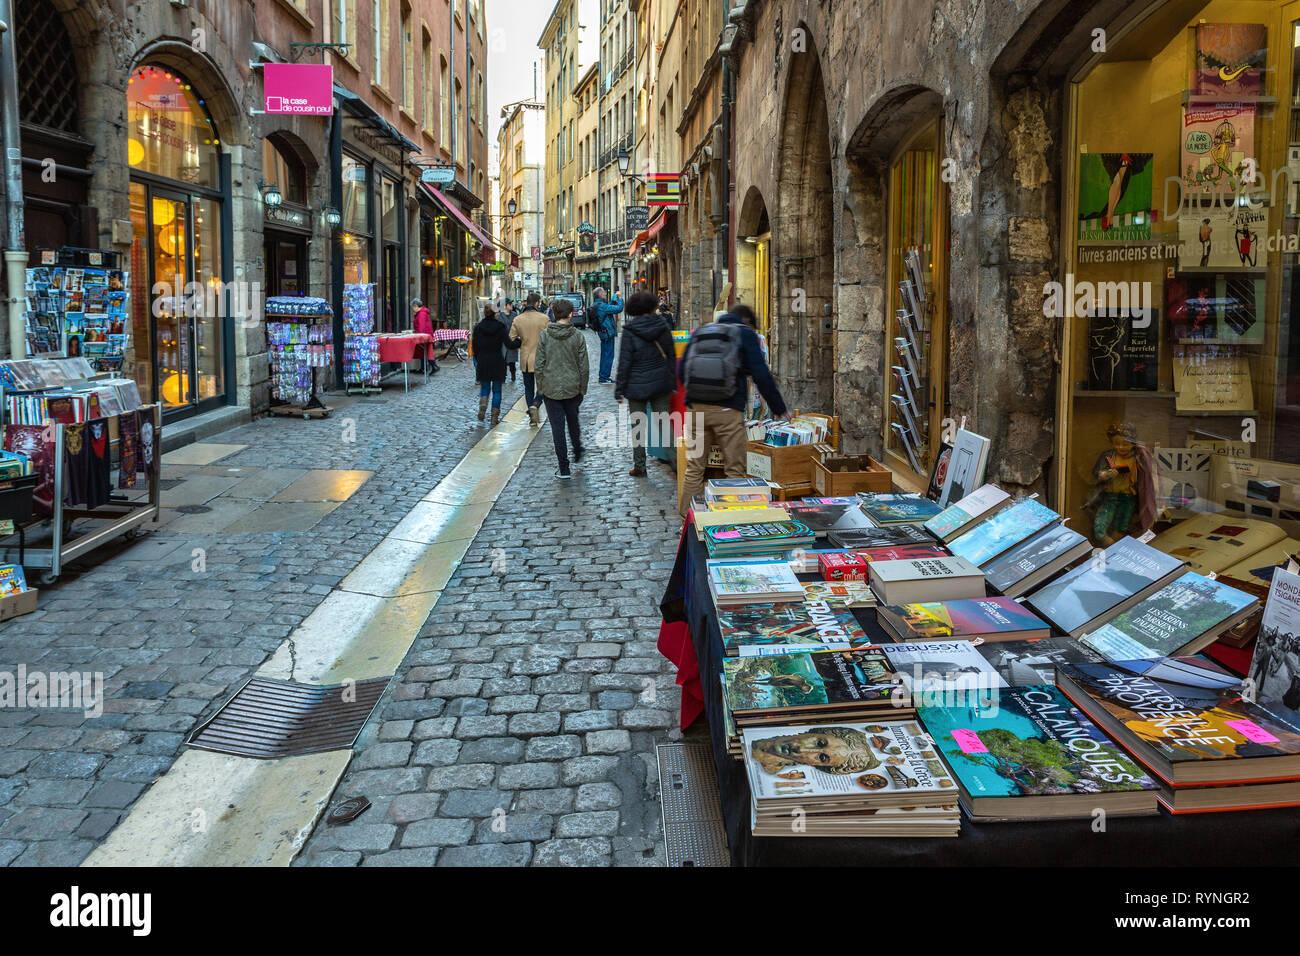 bookseller in Saint John Street, Lyon - Stock Image